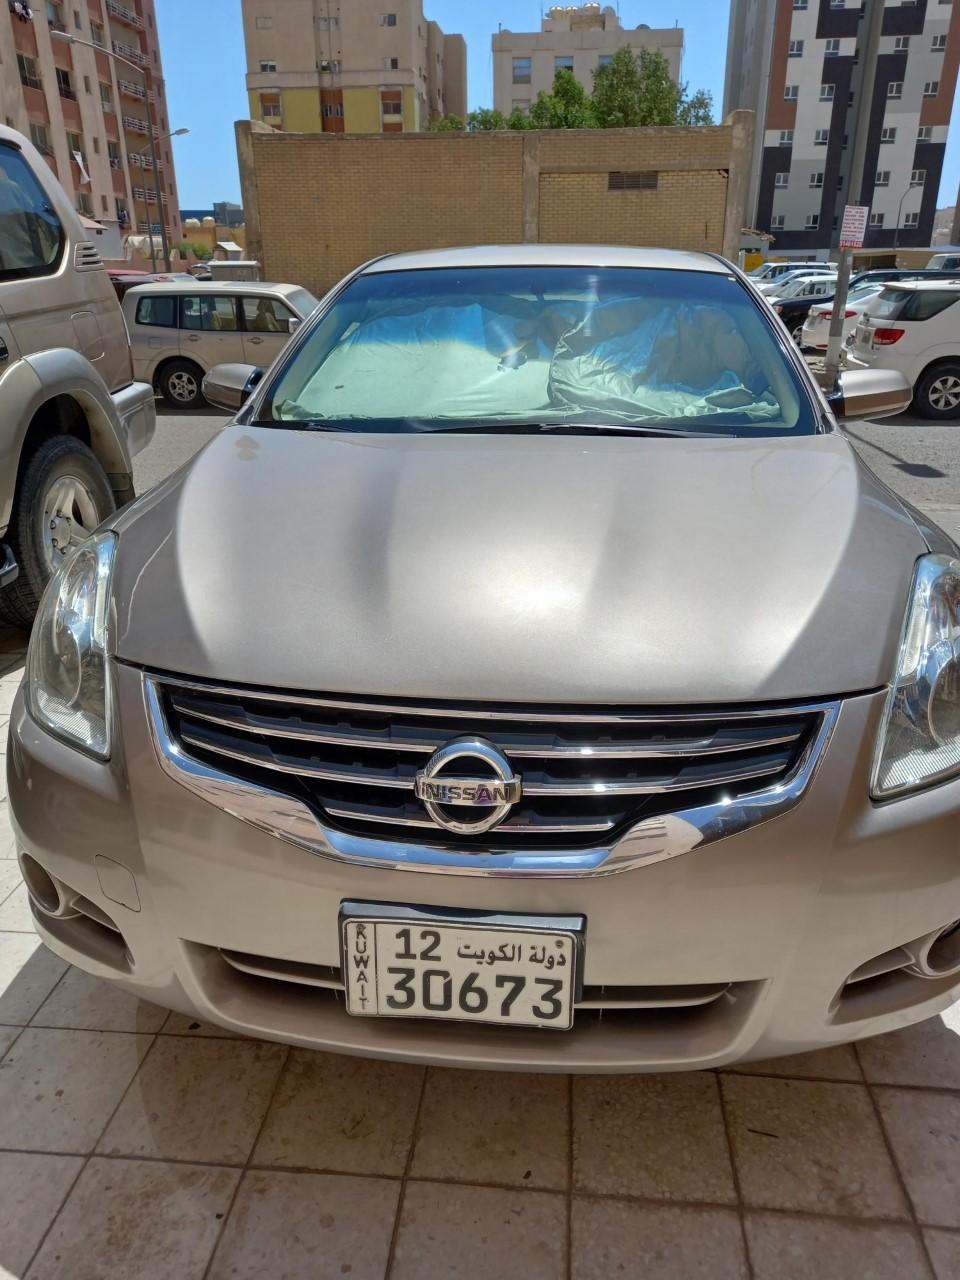 Low mileage Car for sale